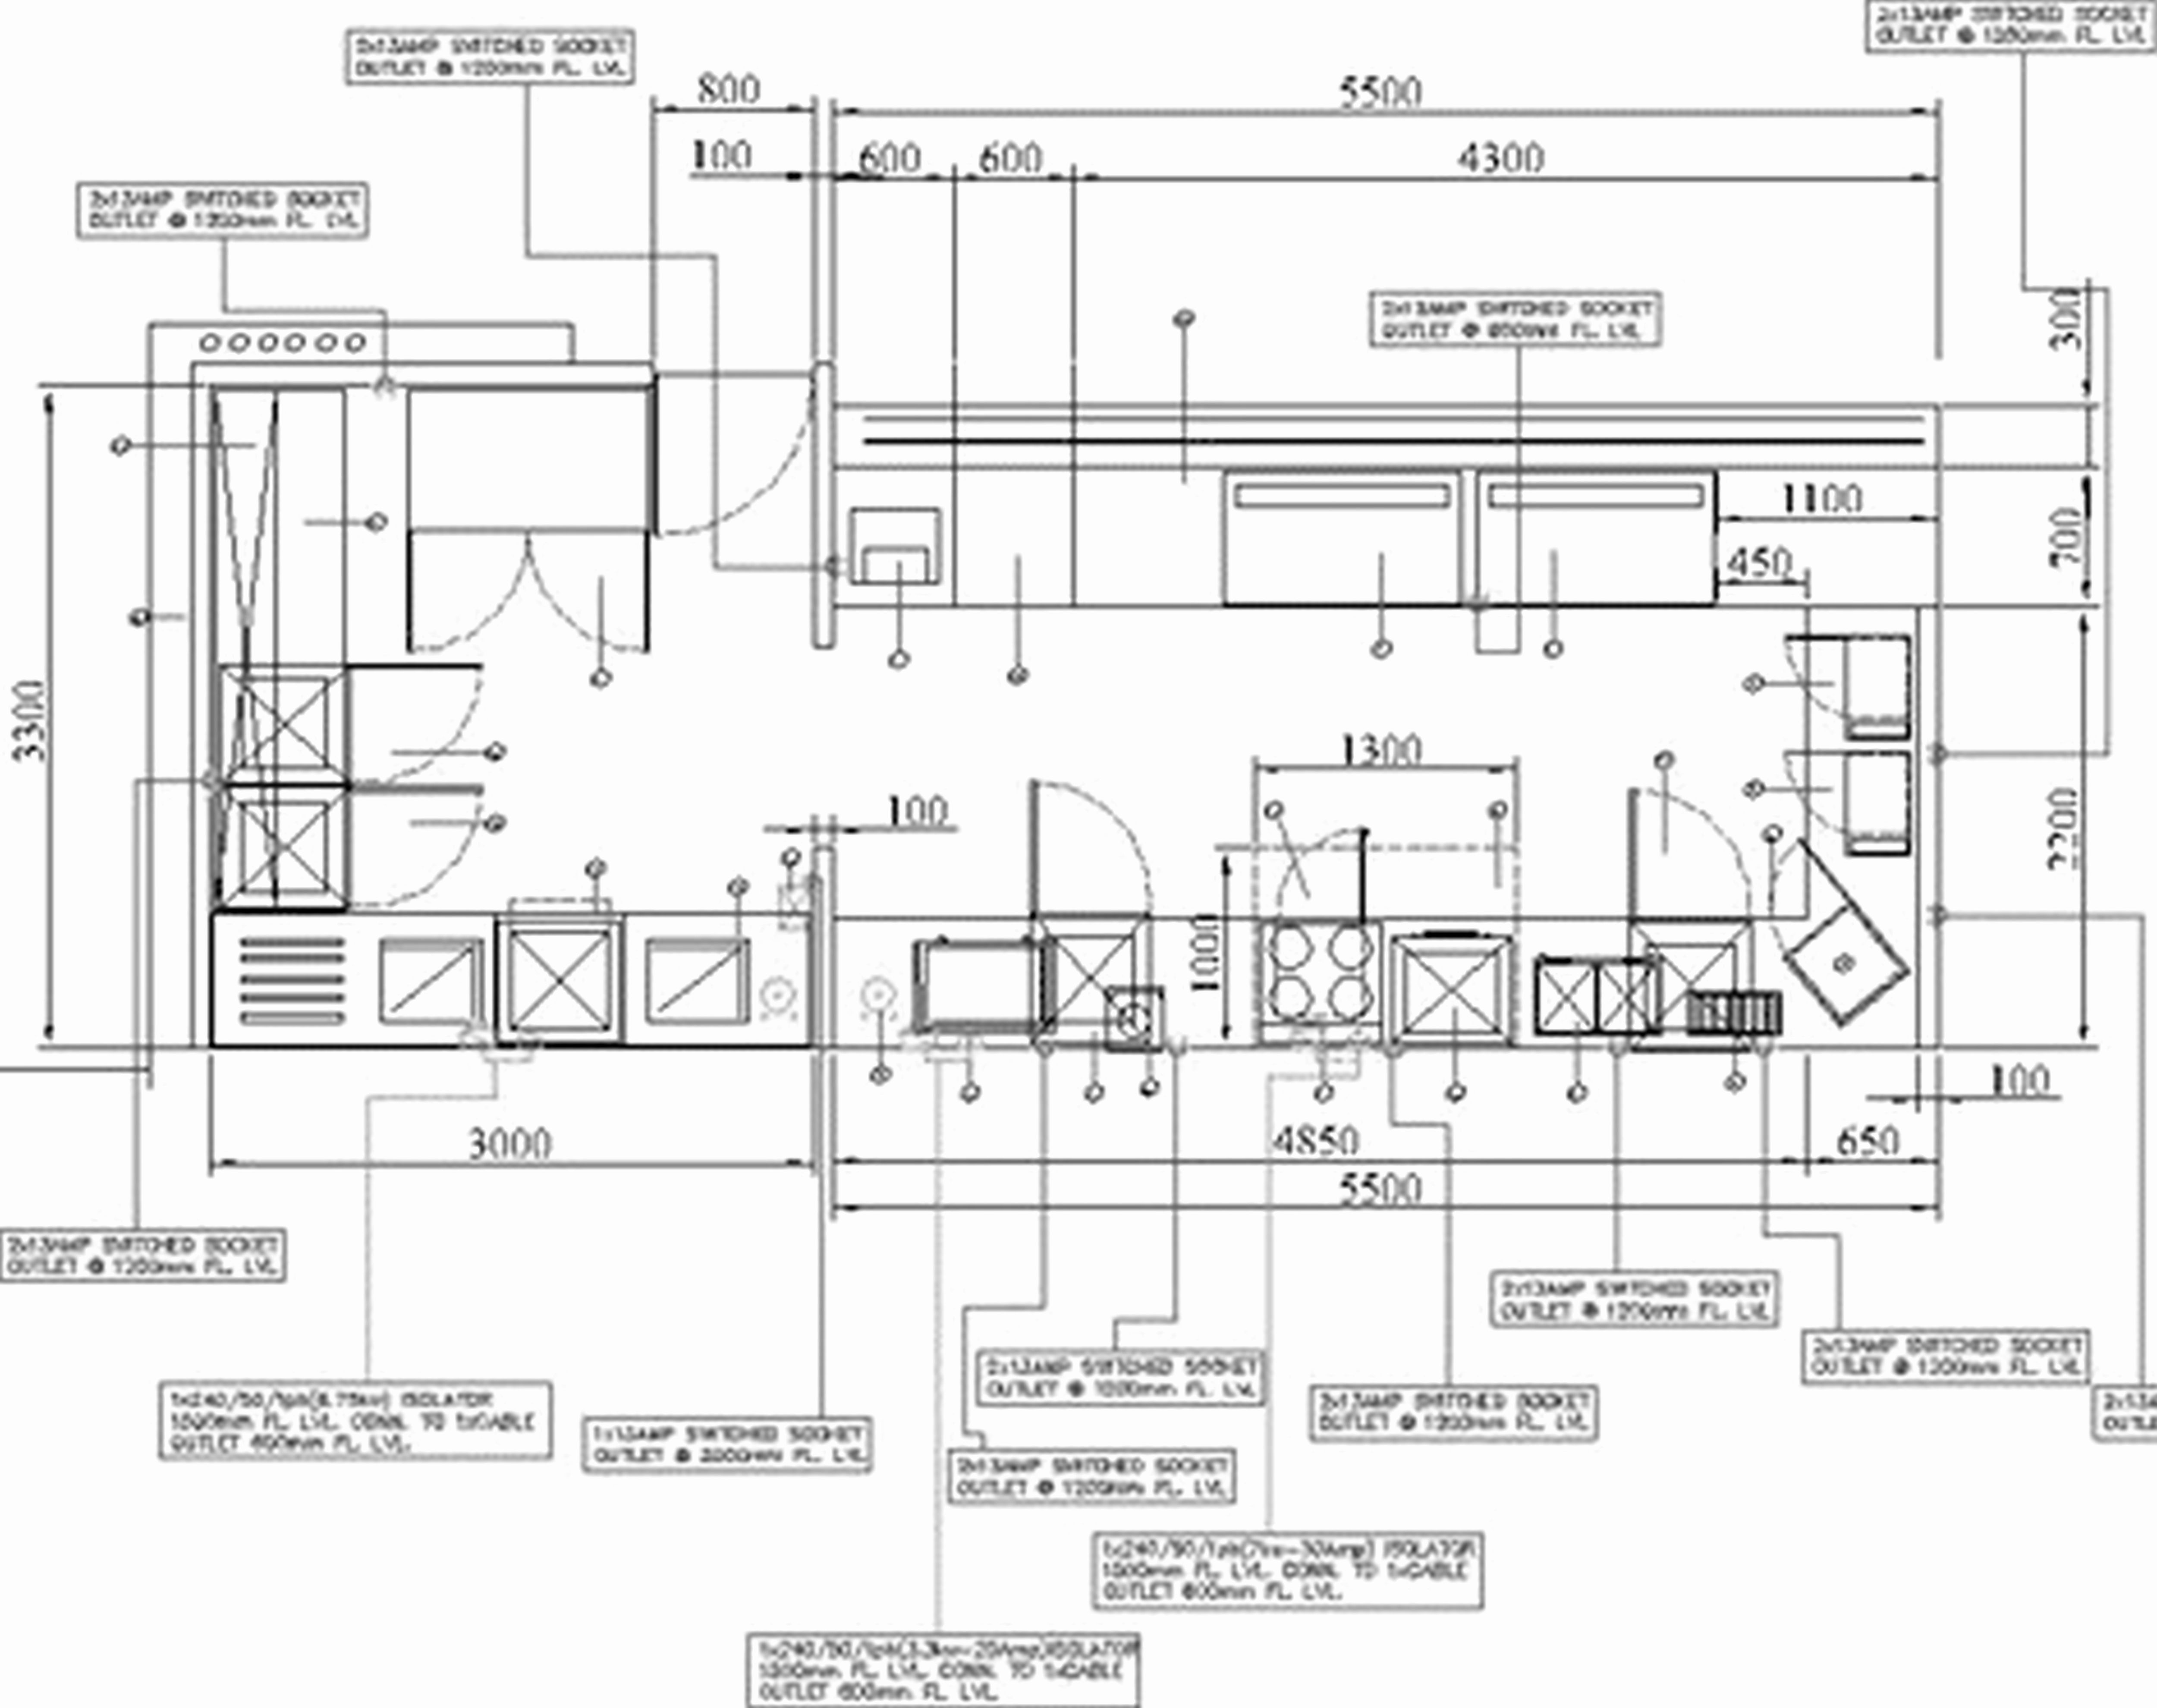 medium resolution of restaurant floor plans with dimensions kitchen commercial kitchen design layouts modern floor plan